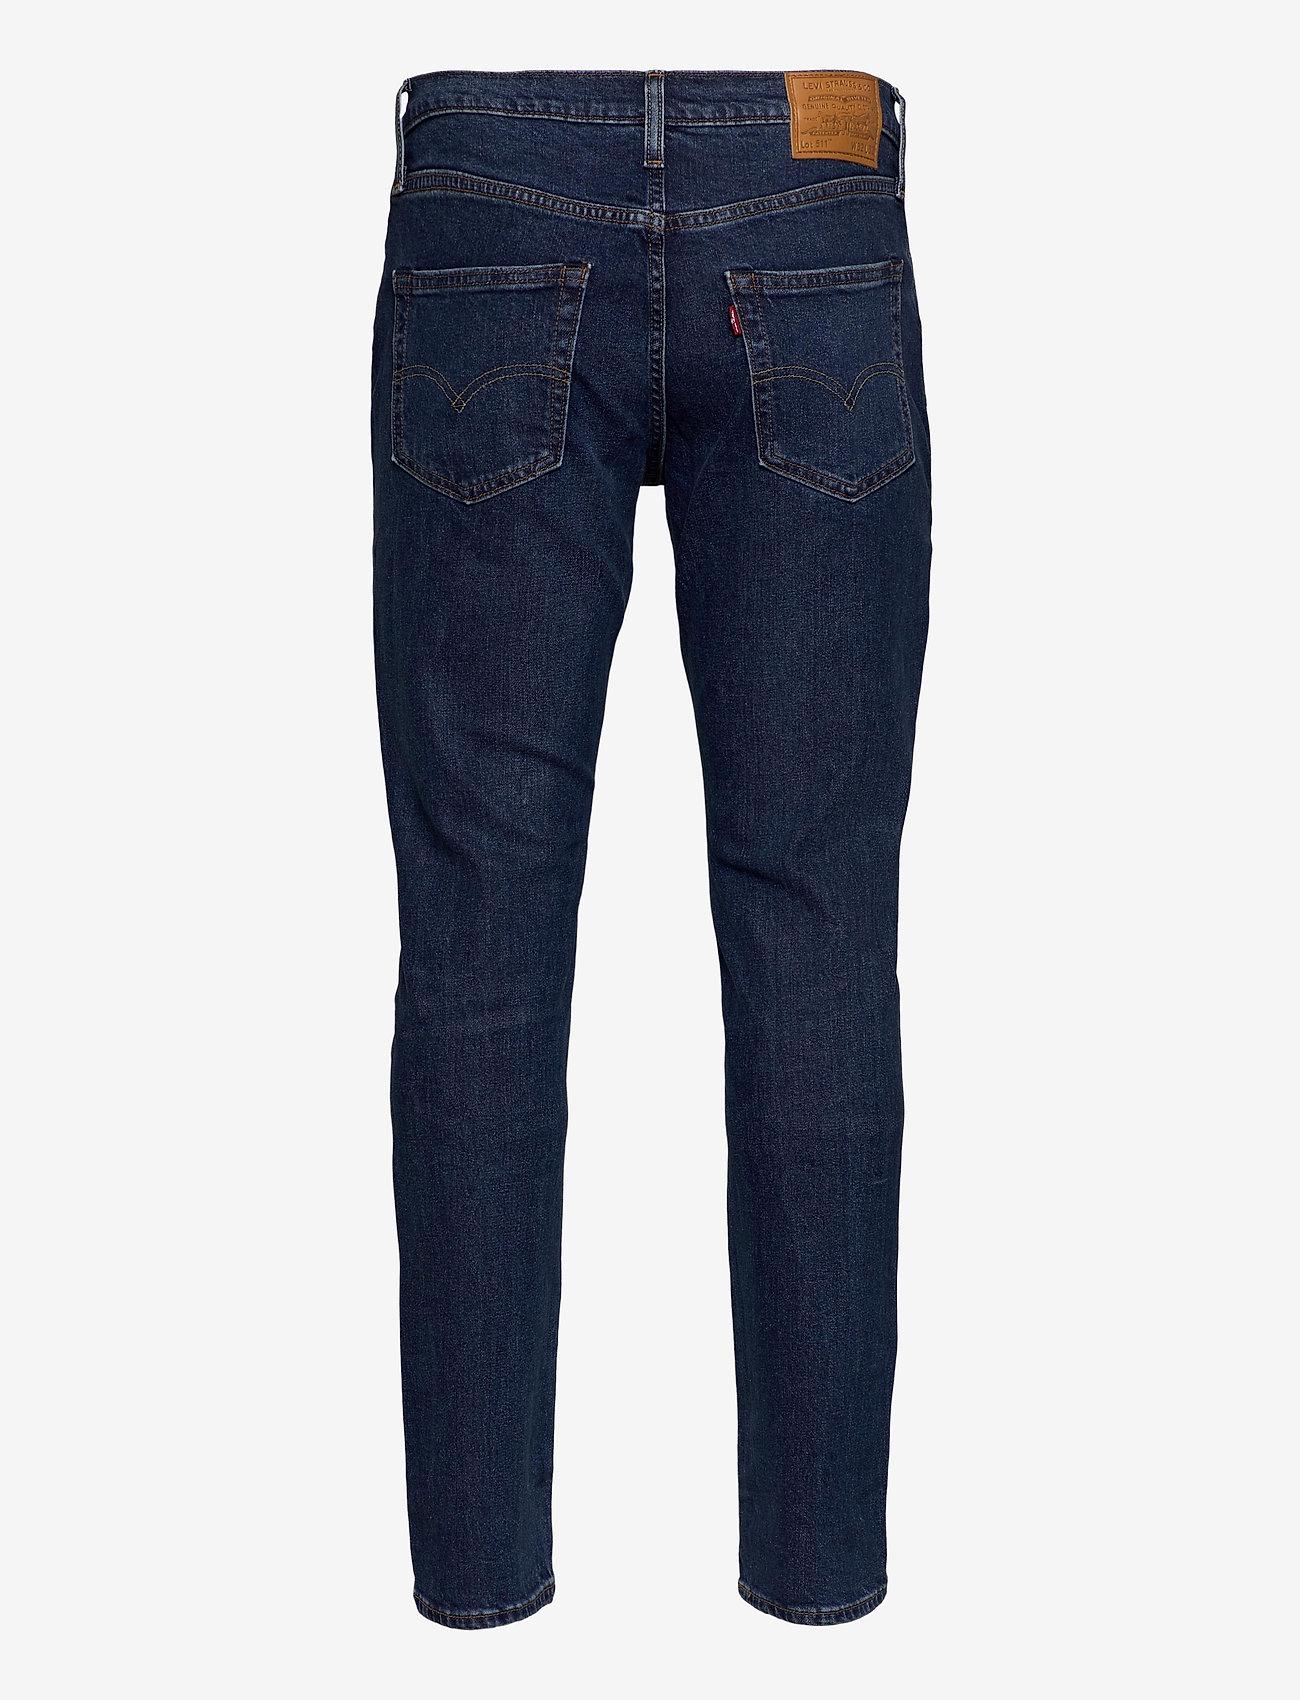 LEVI´S Men - 511 SLIM PONCHO AND RIGHTY ADV - slim jeans - dark indigo - worn in - 1